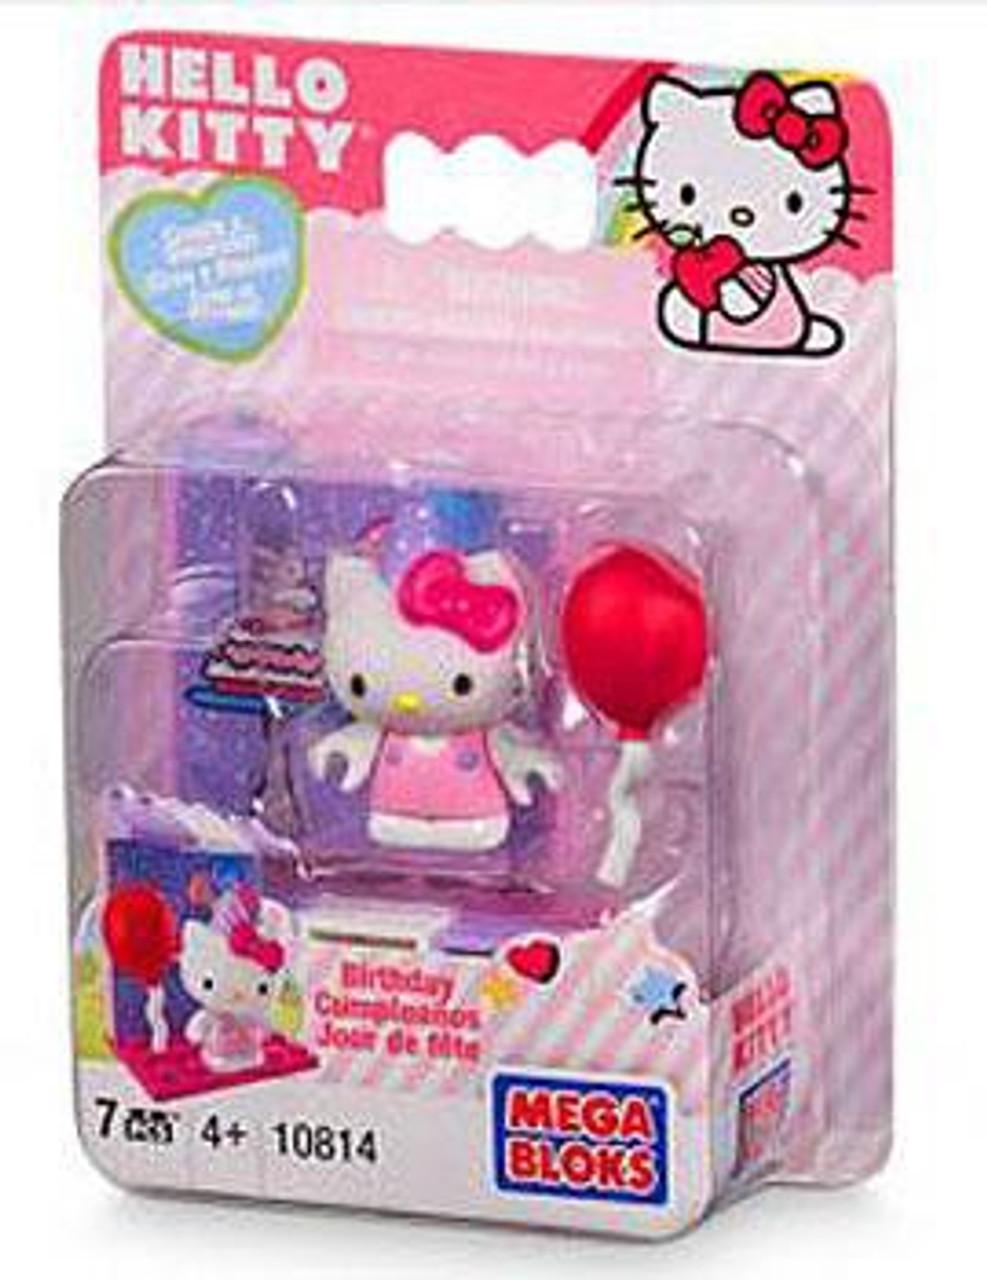 Mega Bloks Hello Kitty Birthday Set #10814